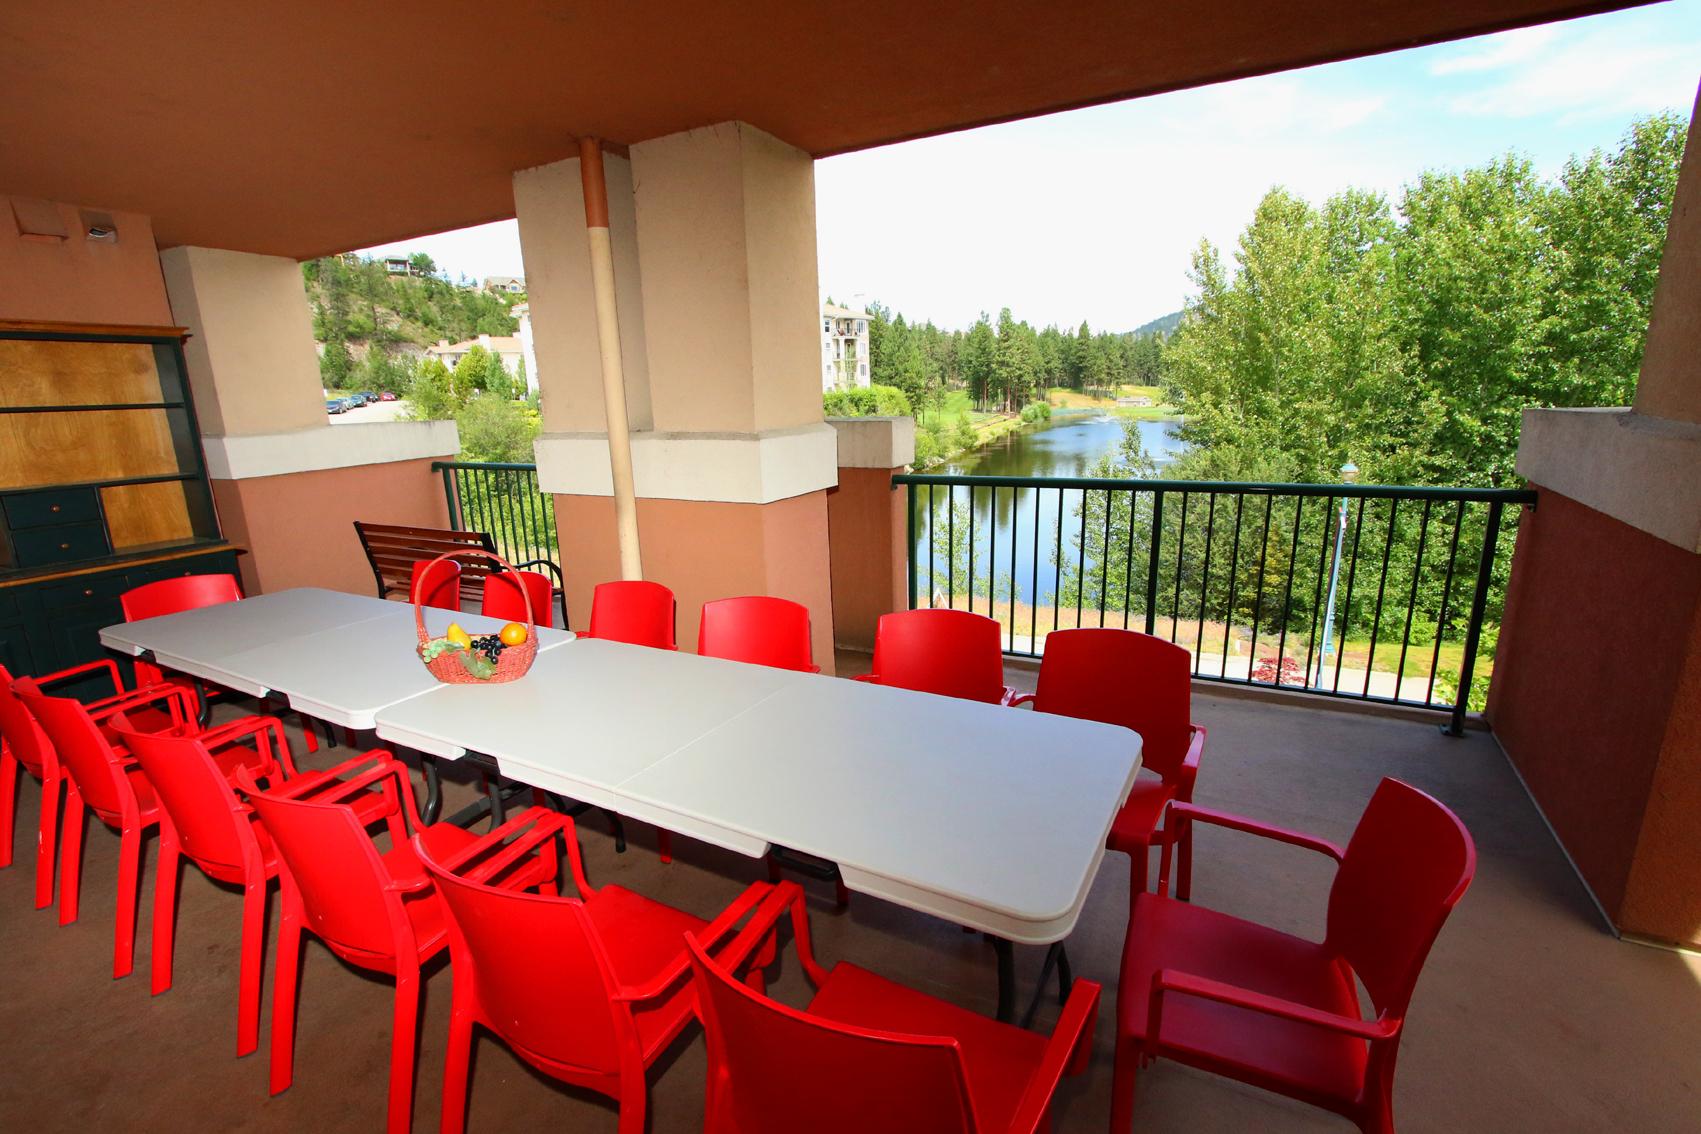 201 B  Huge Patio Els Lake Views  Studio with